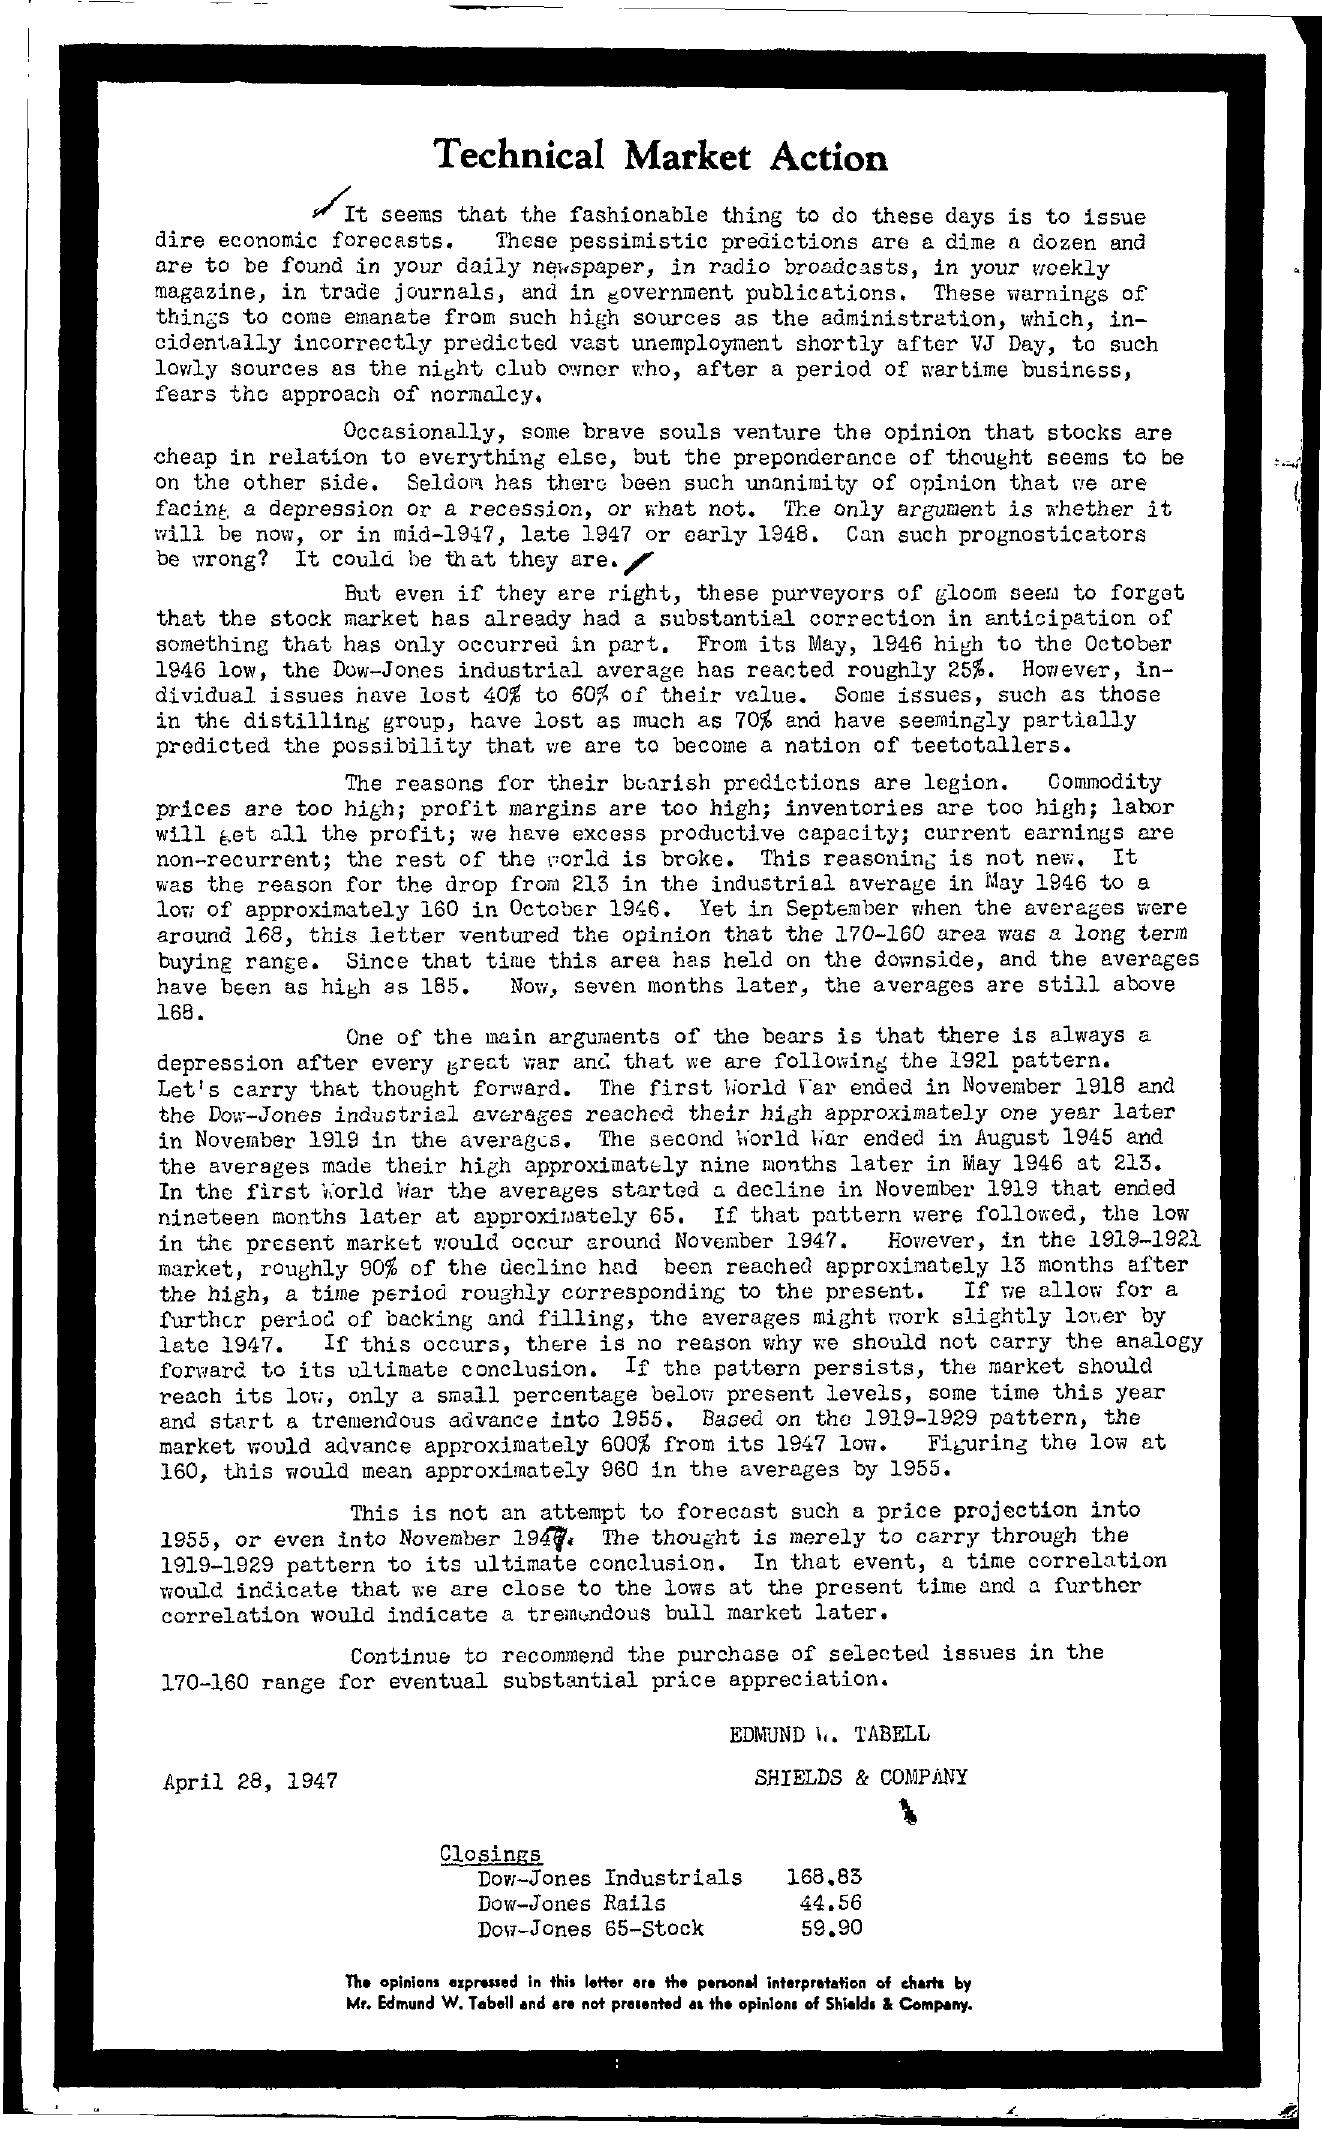 Tabell's Market Letter - April 28, 1947